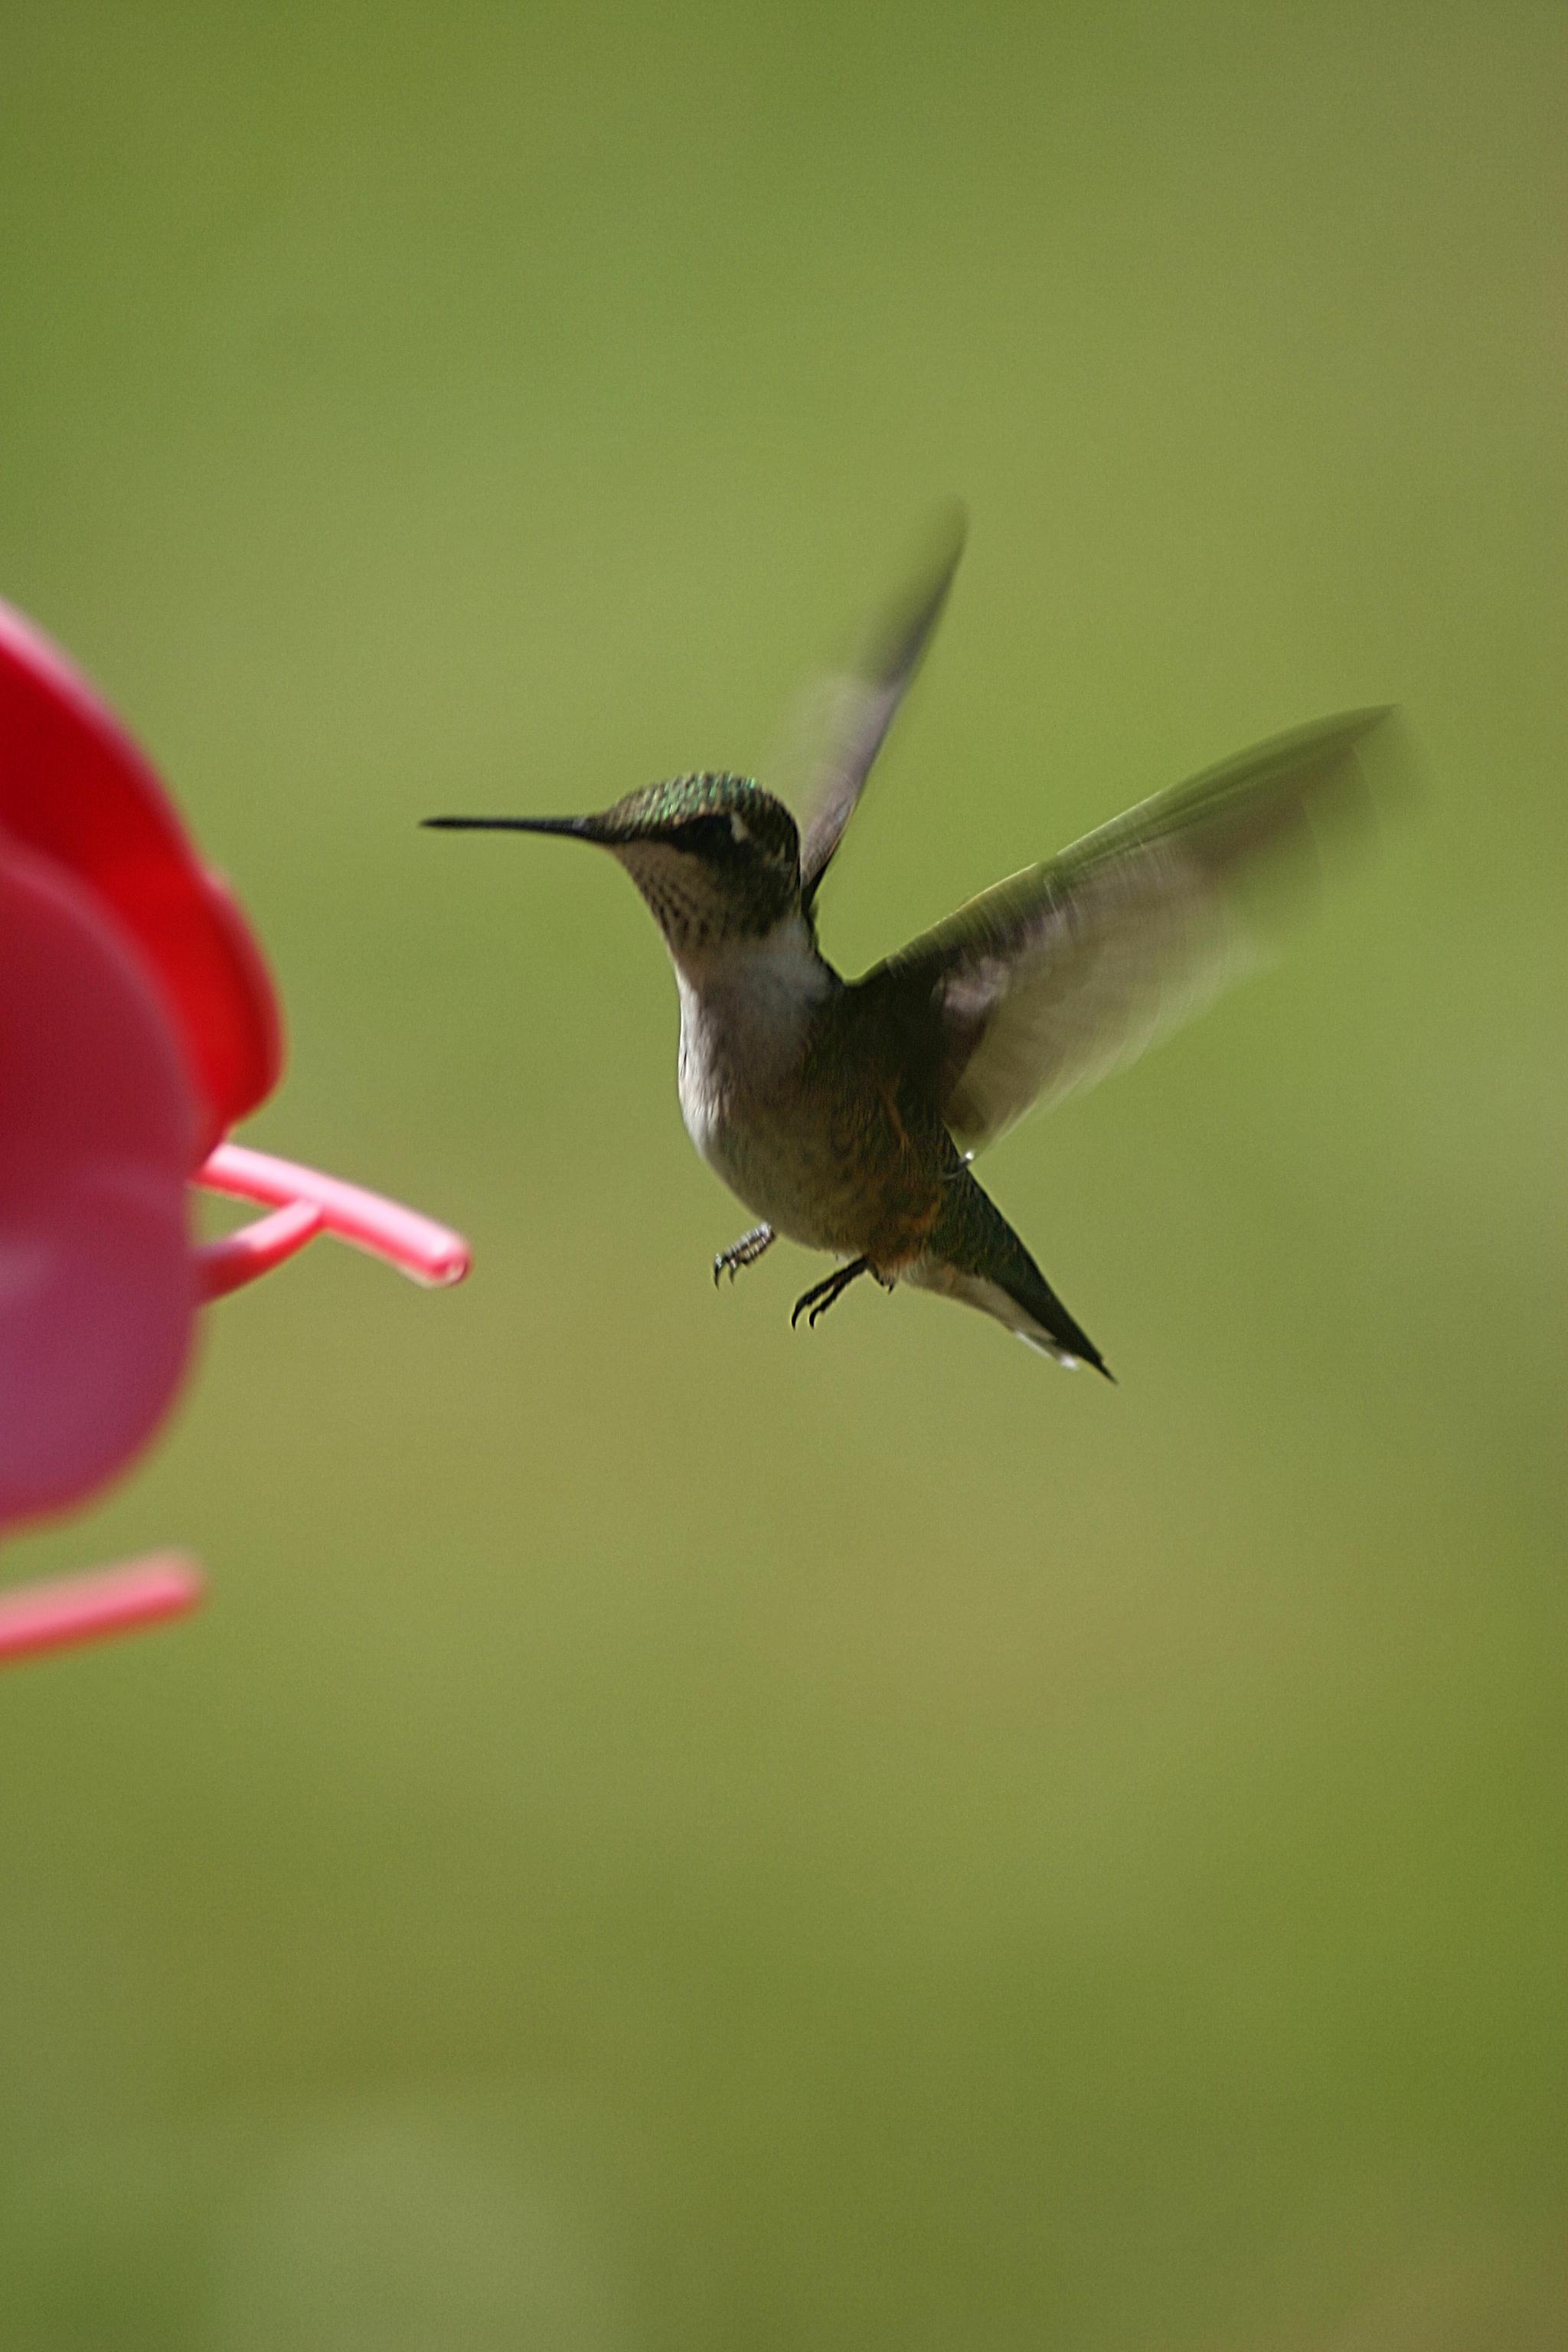 Mid-Air Humming Bird